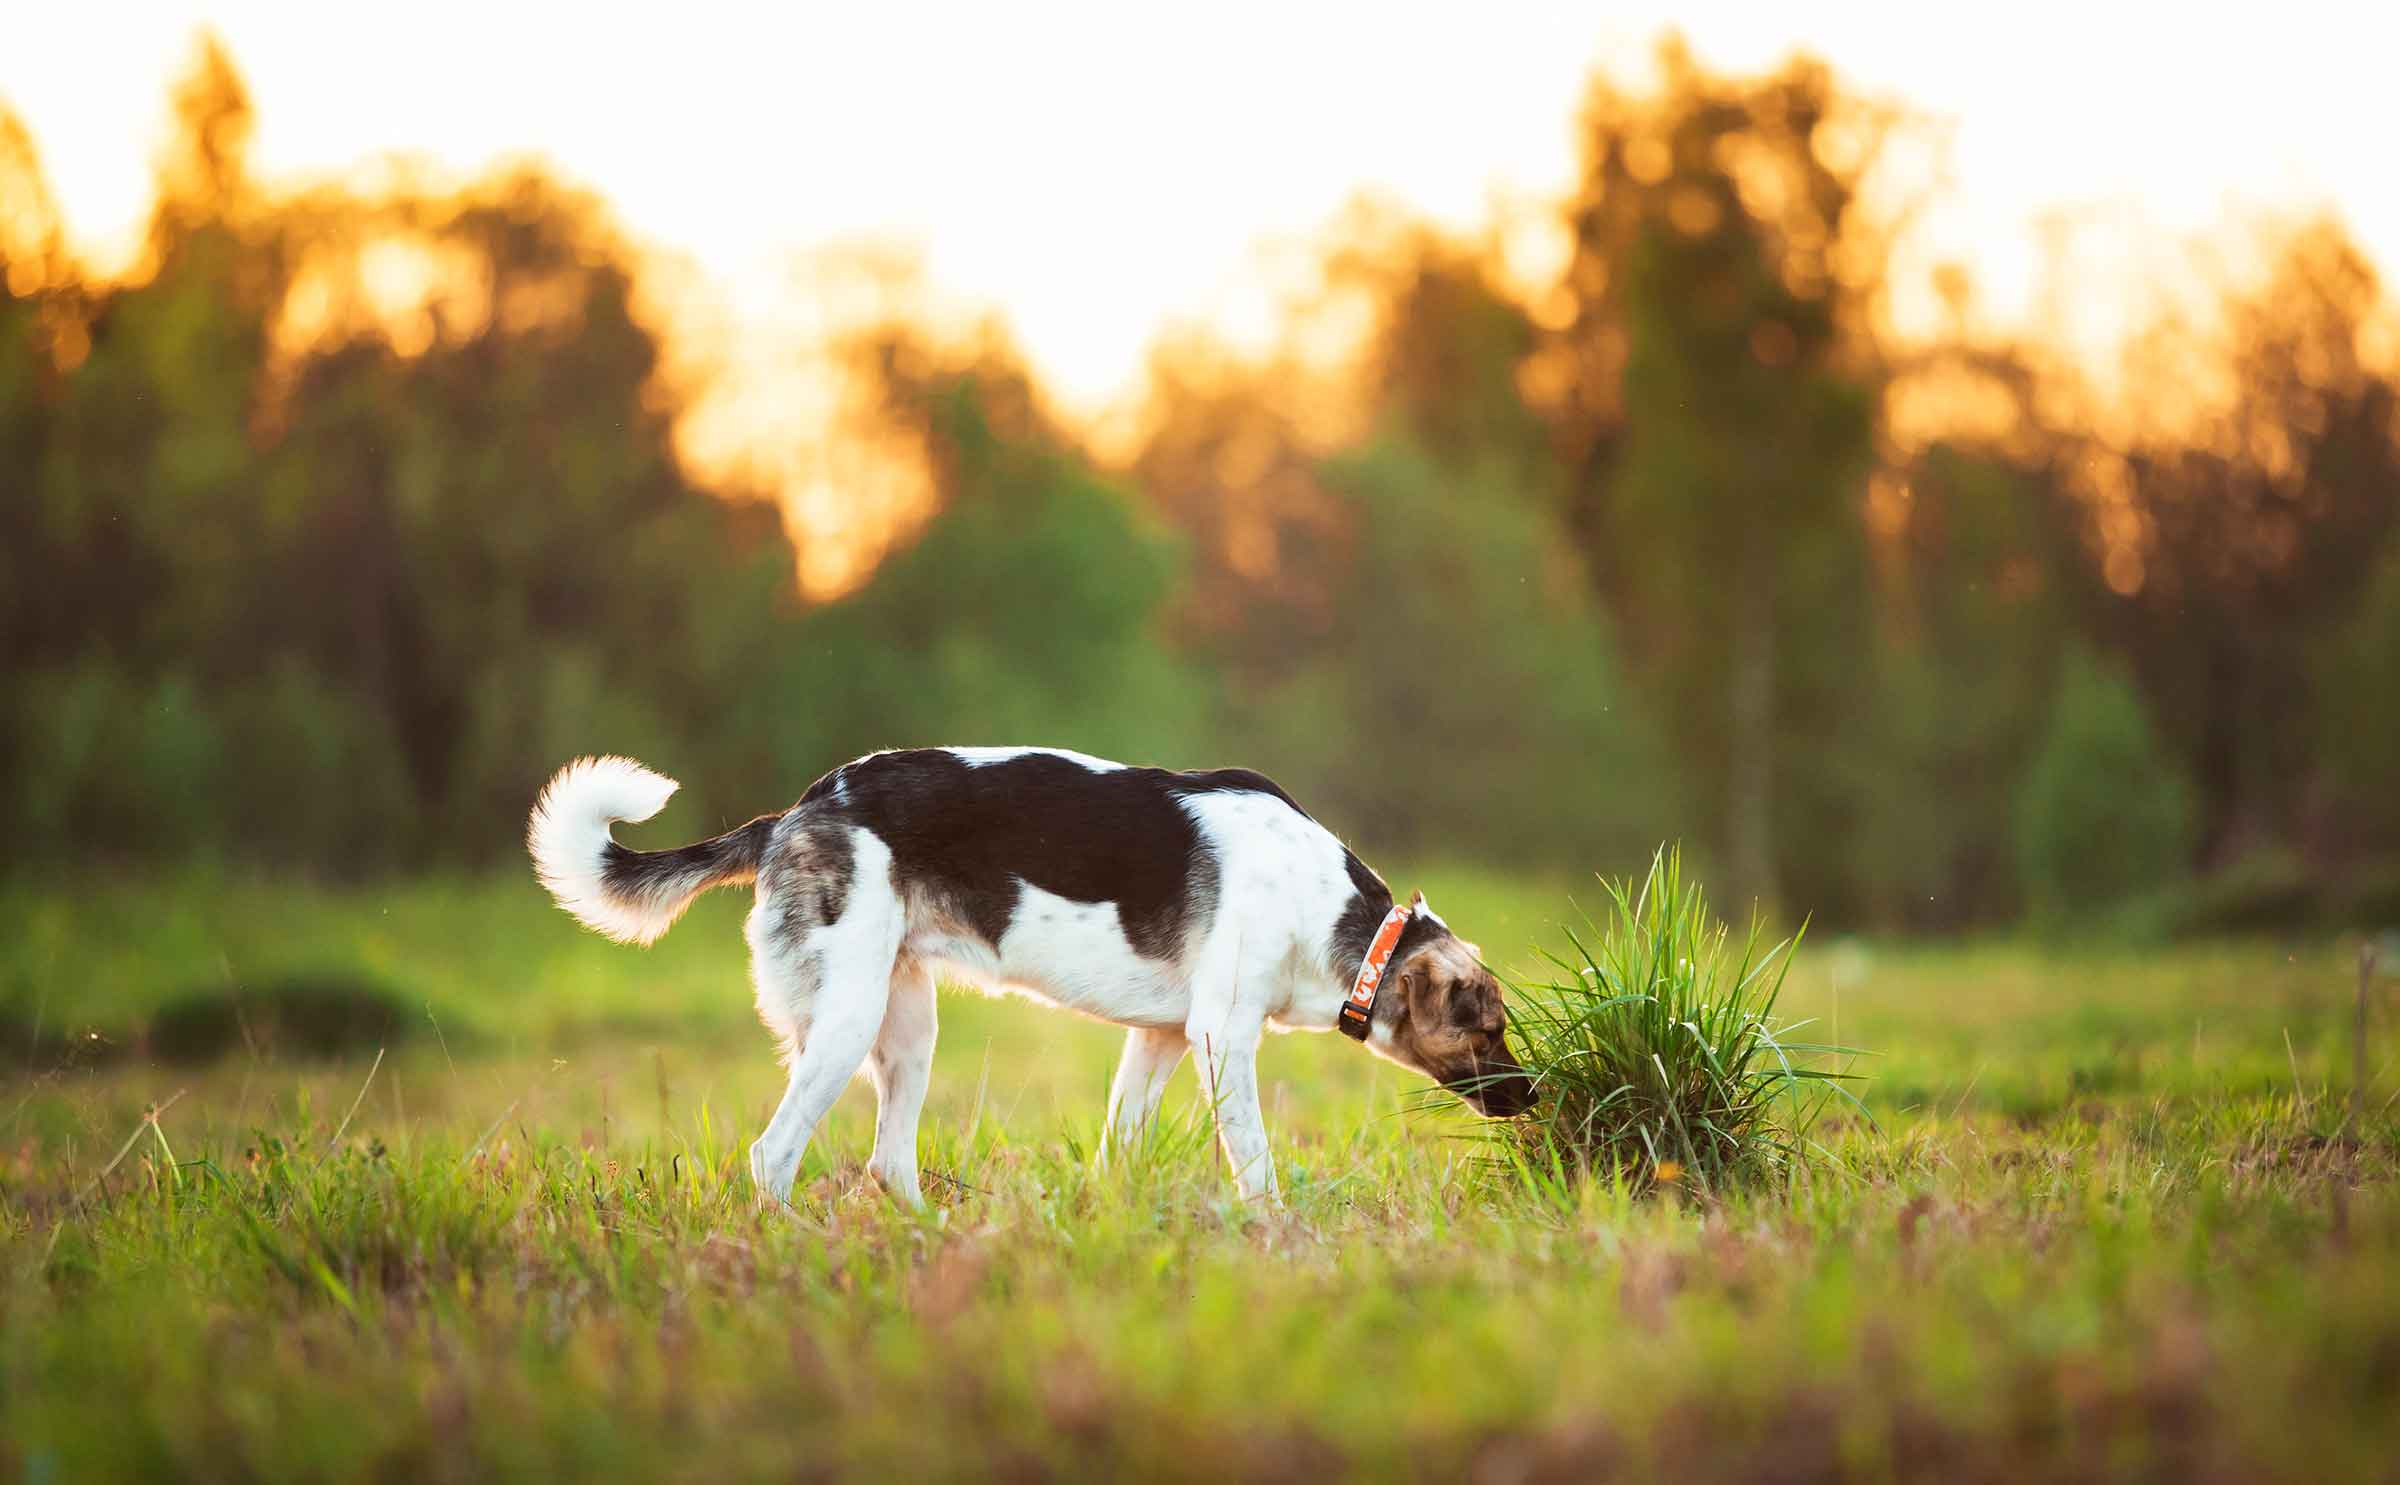 Darwin's Ranks Better than Most Dog Food Brands in Glyphosate Test